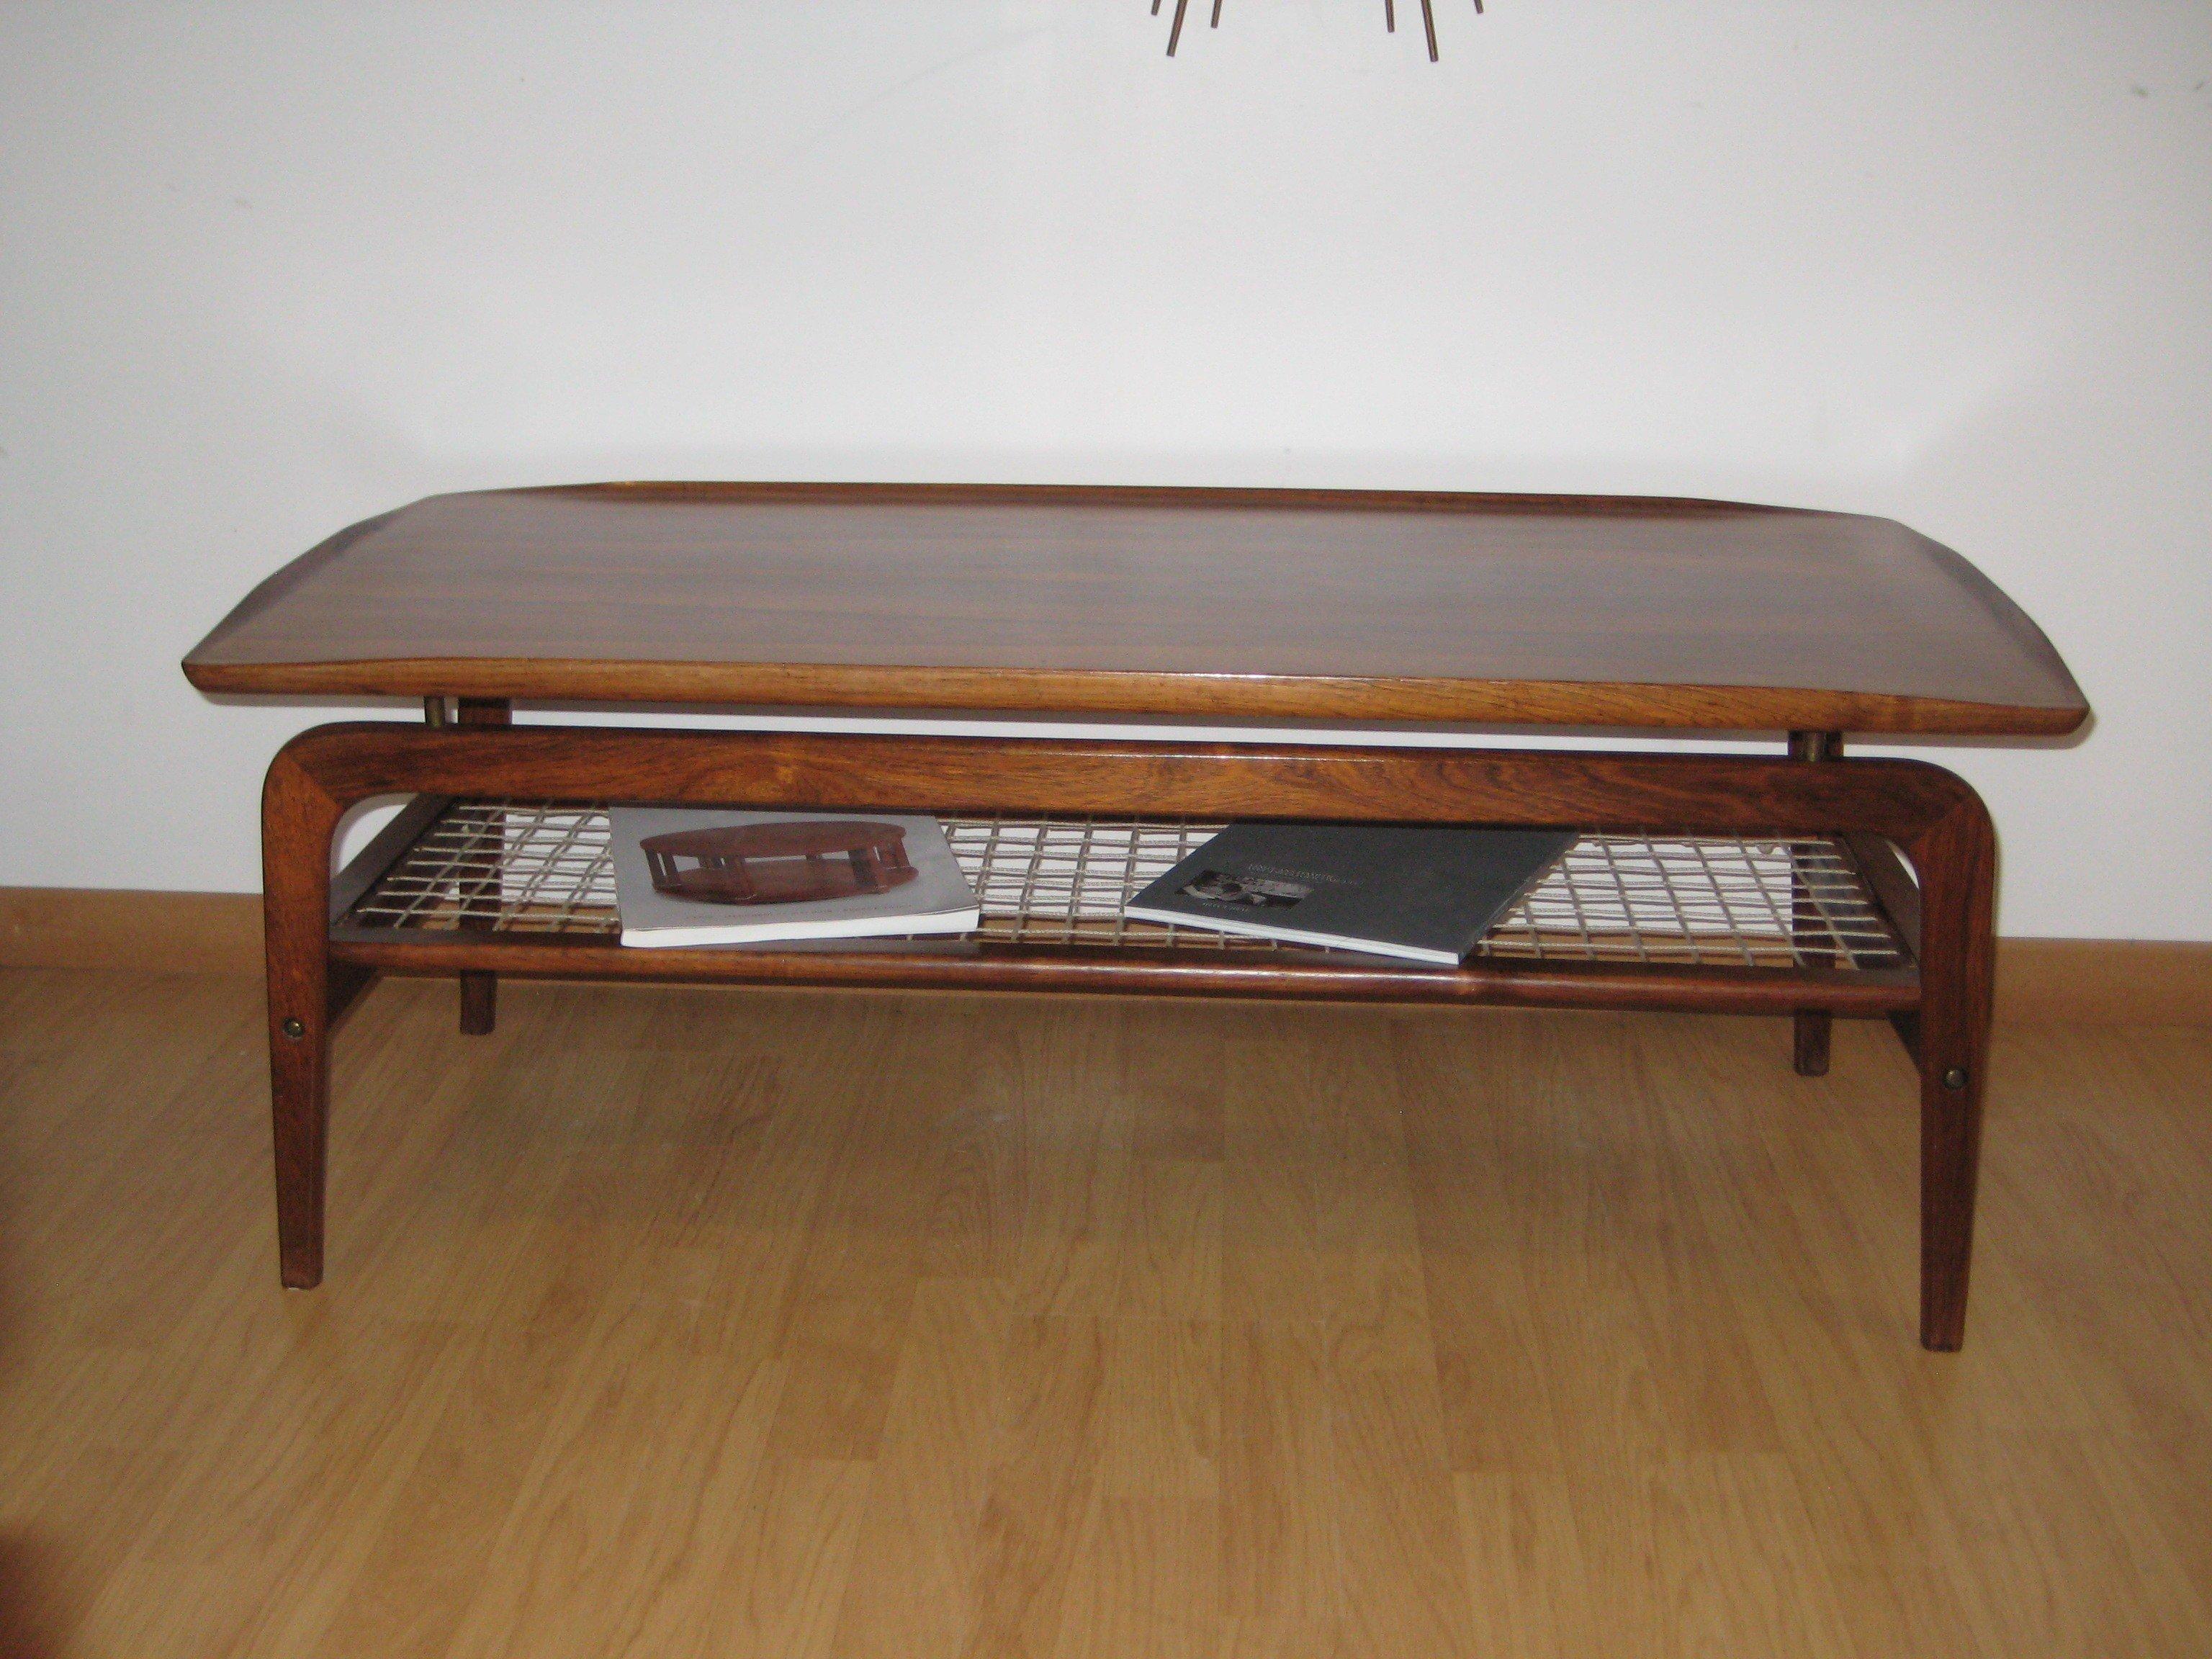 Scandinavian rosewood coffee table Arne HOVMAND OLSEN 1950s